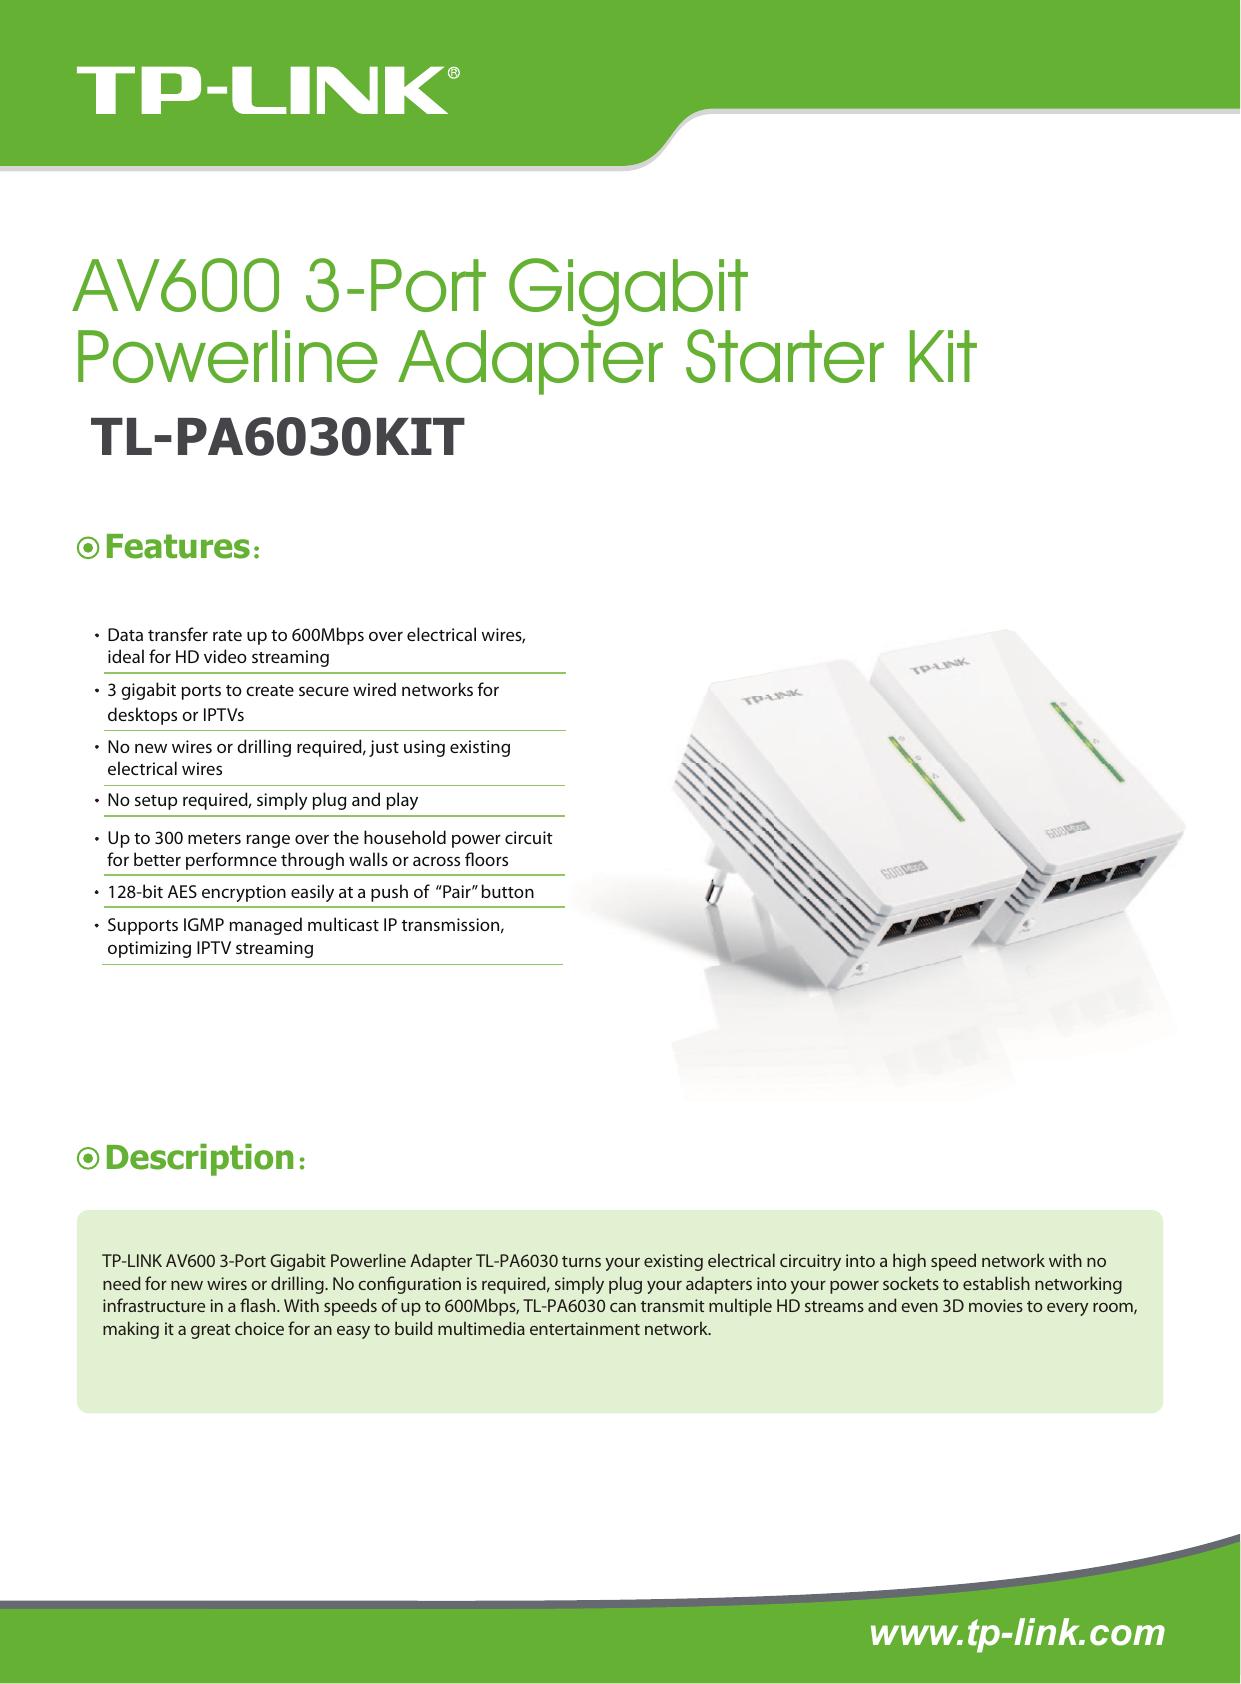 TP-LINK TL-PA6030KIT V1 POWERLINE WINDOWS 7 DRIVERS DOWNLOAD (2019)